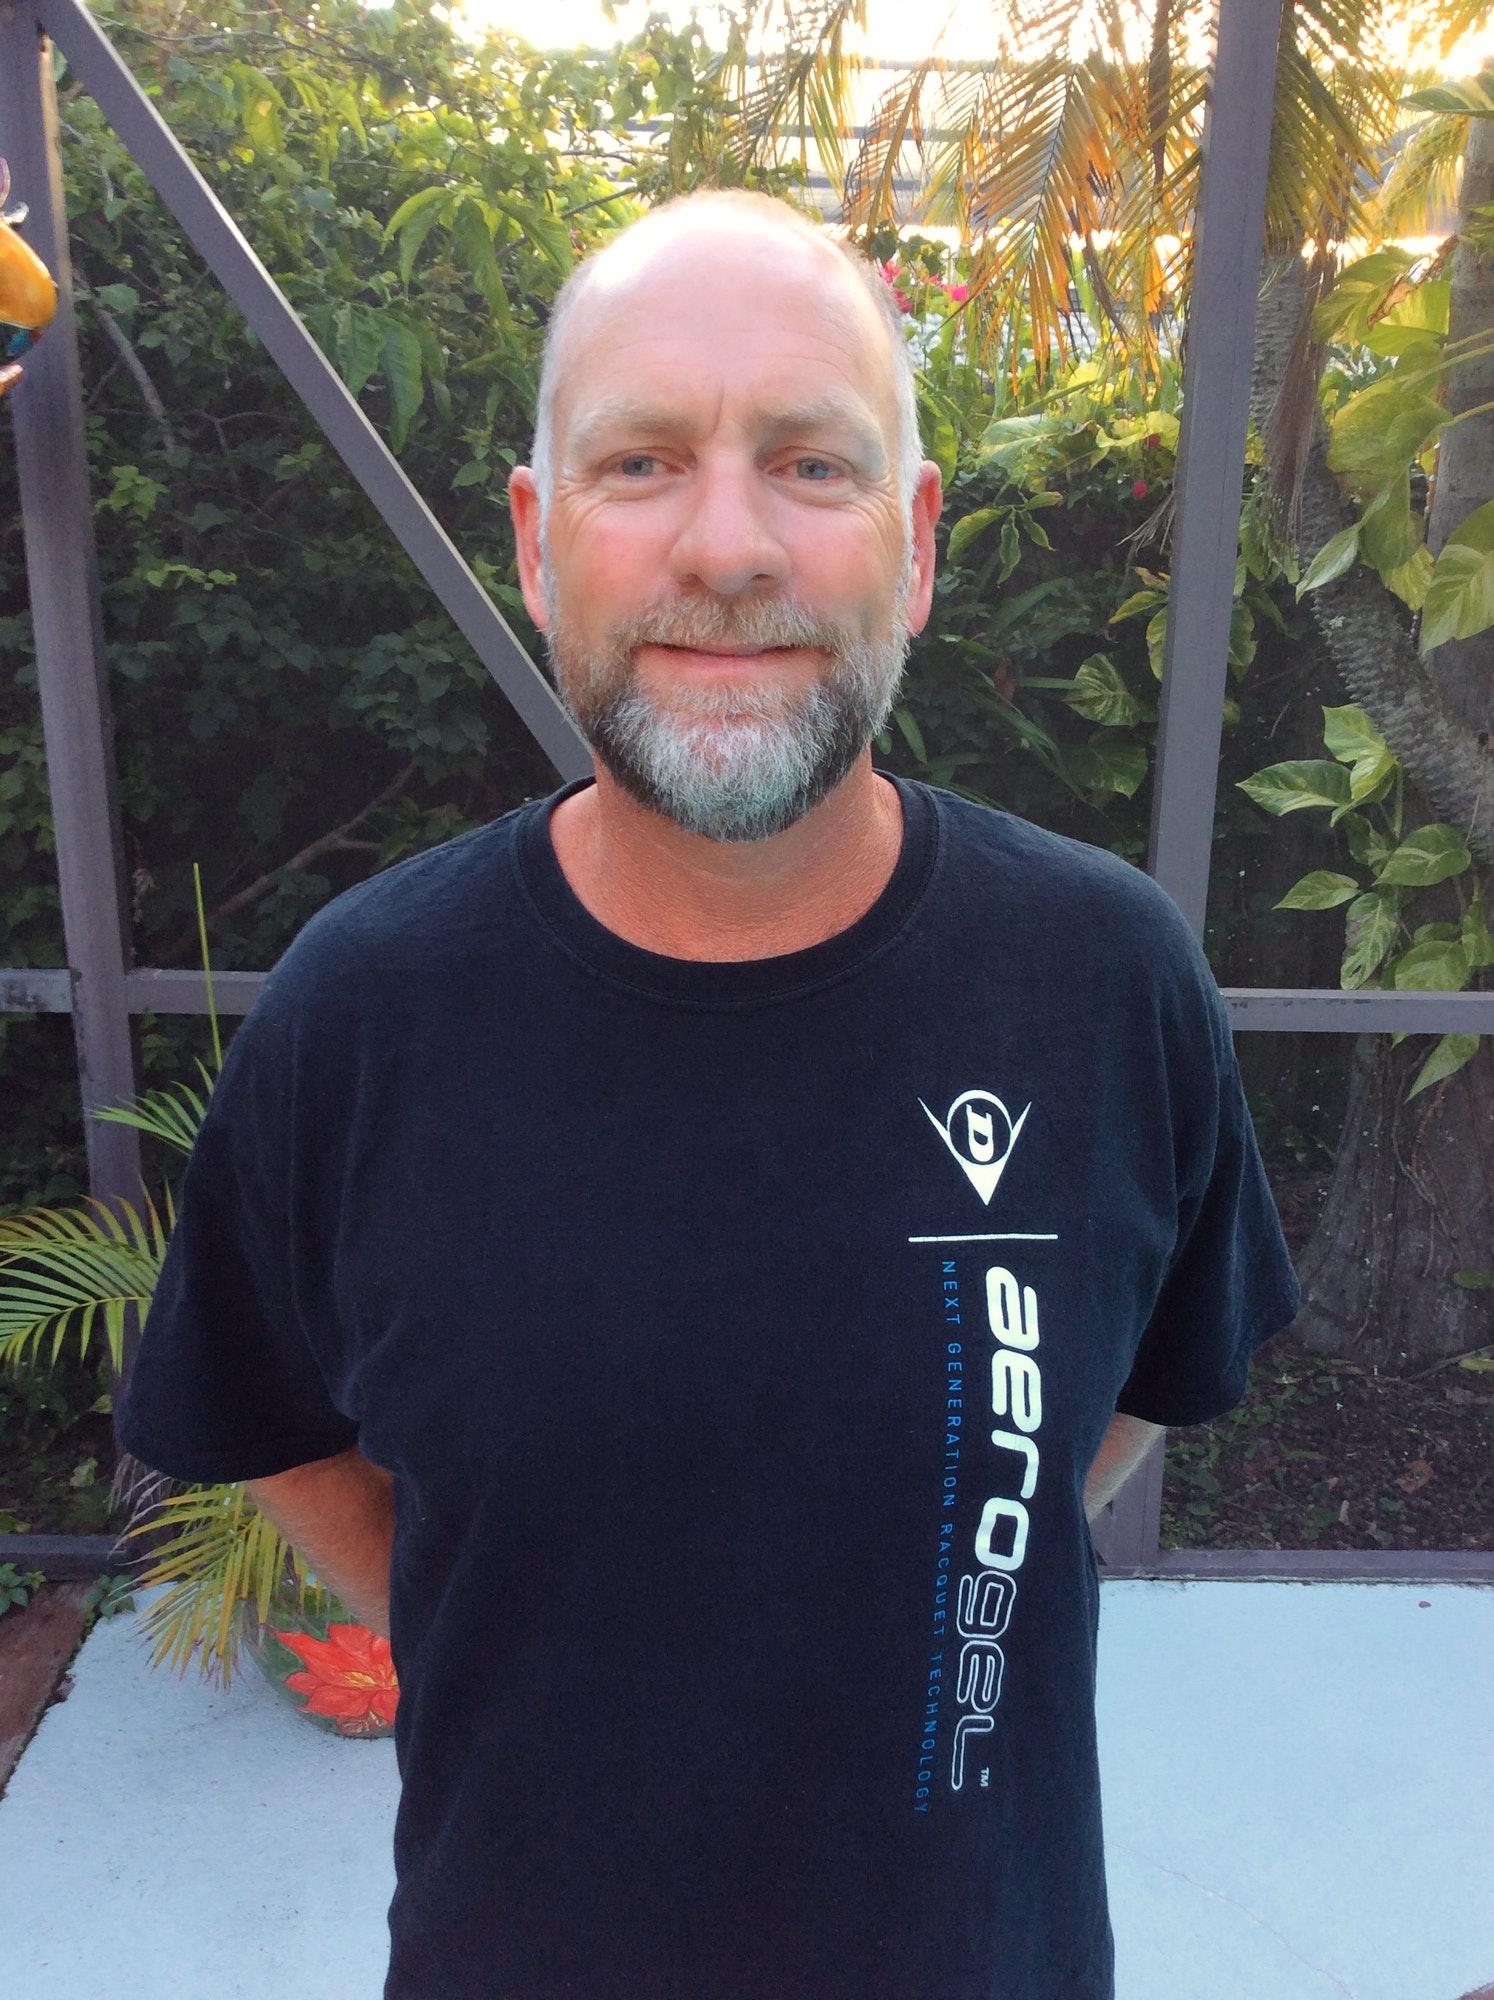 Jeff L. teaches tennis lessons in Sarasota, FL